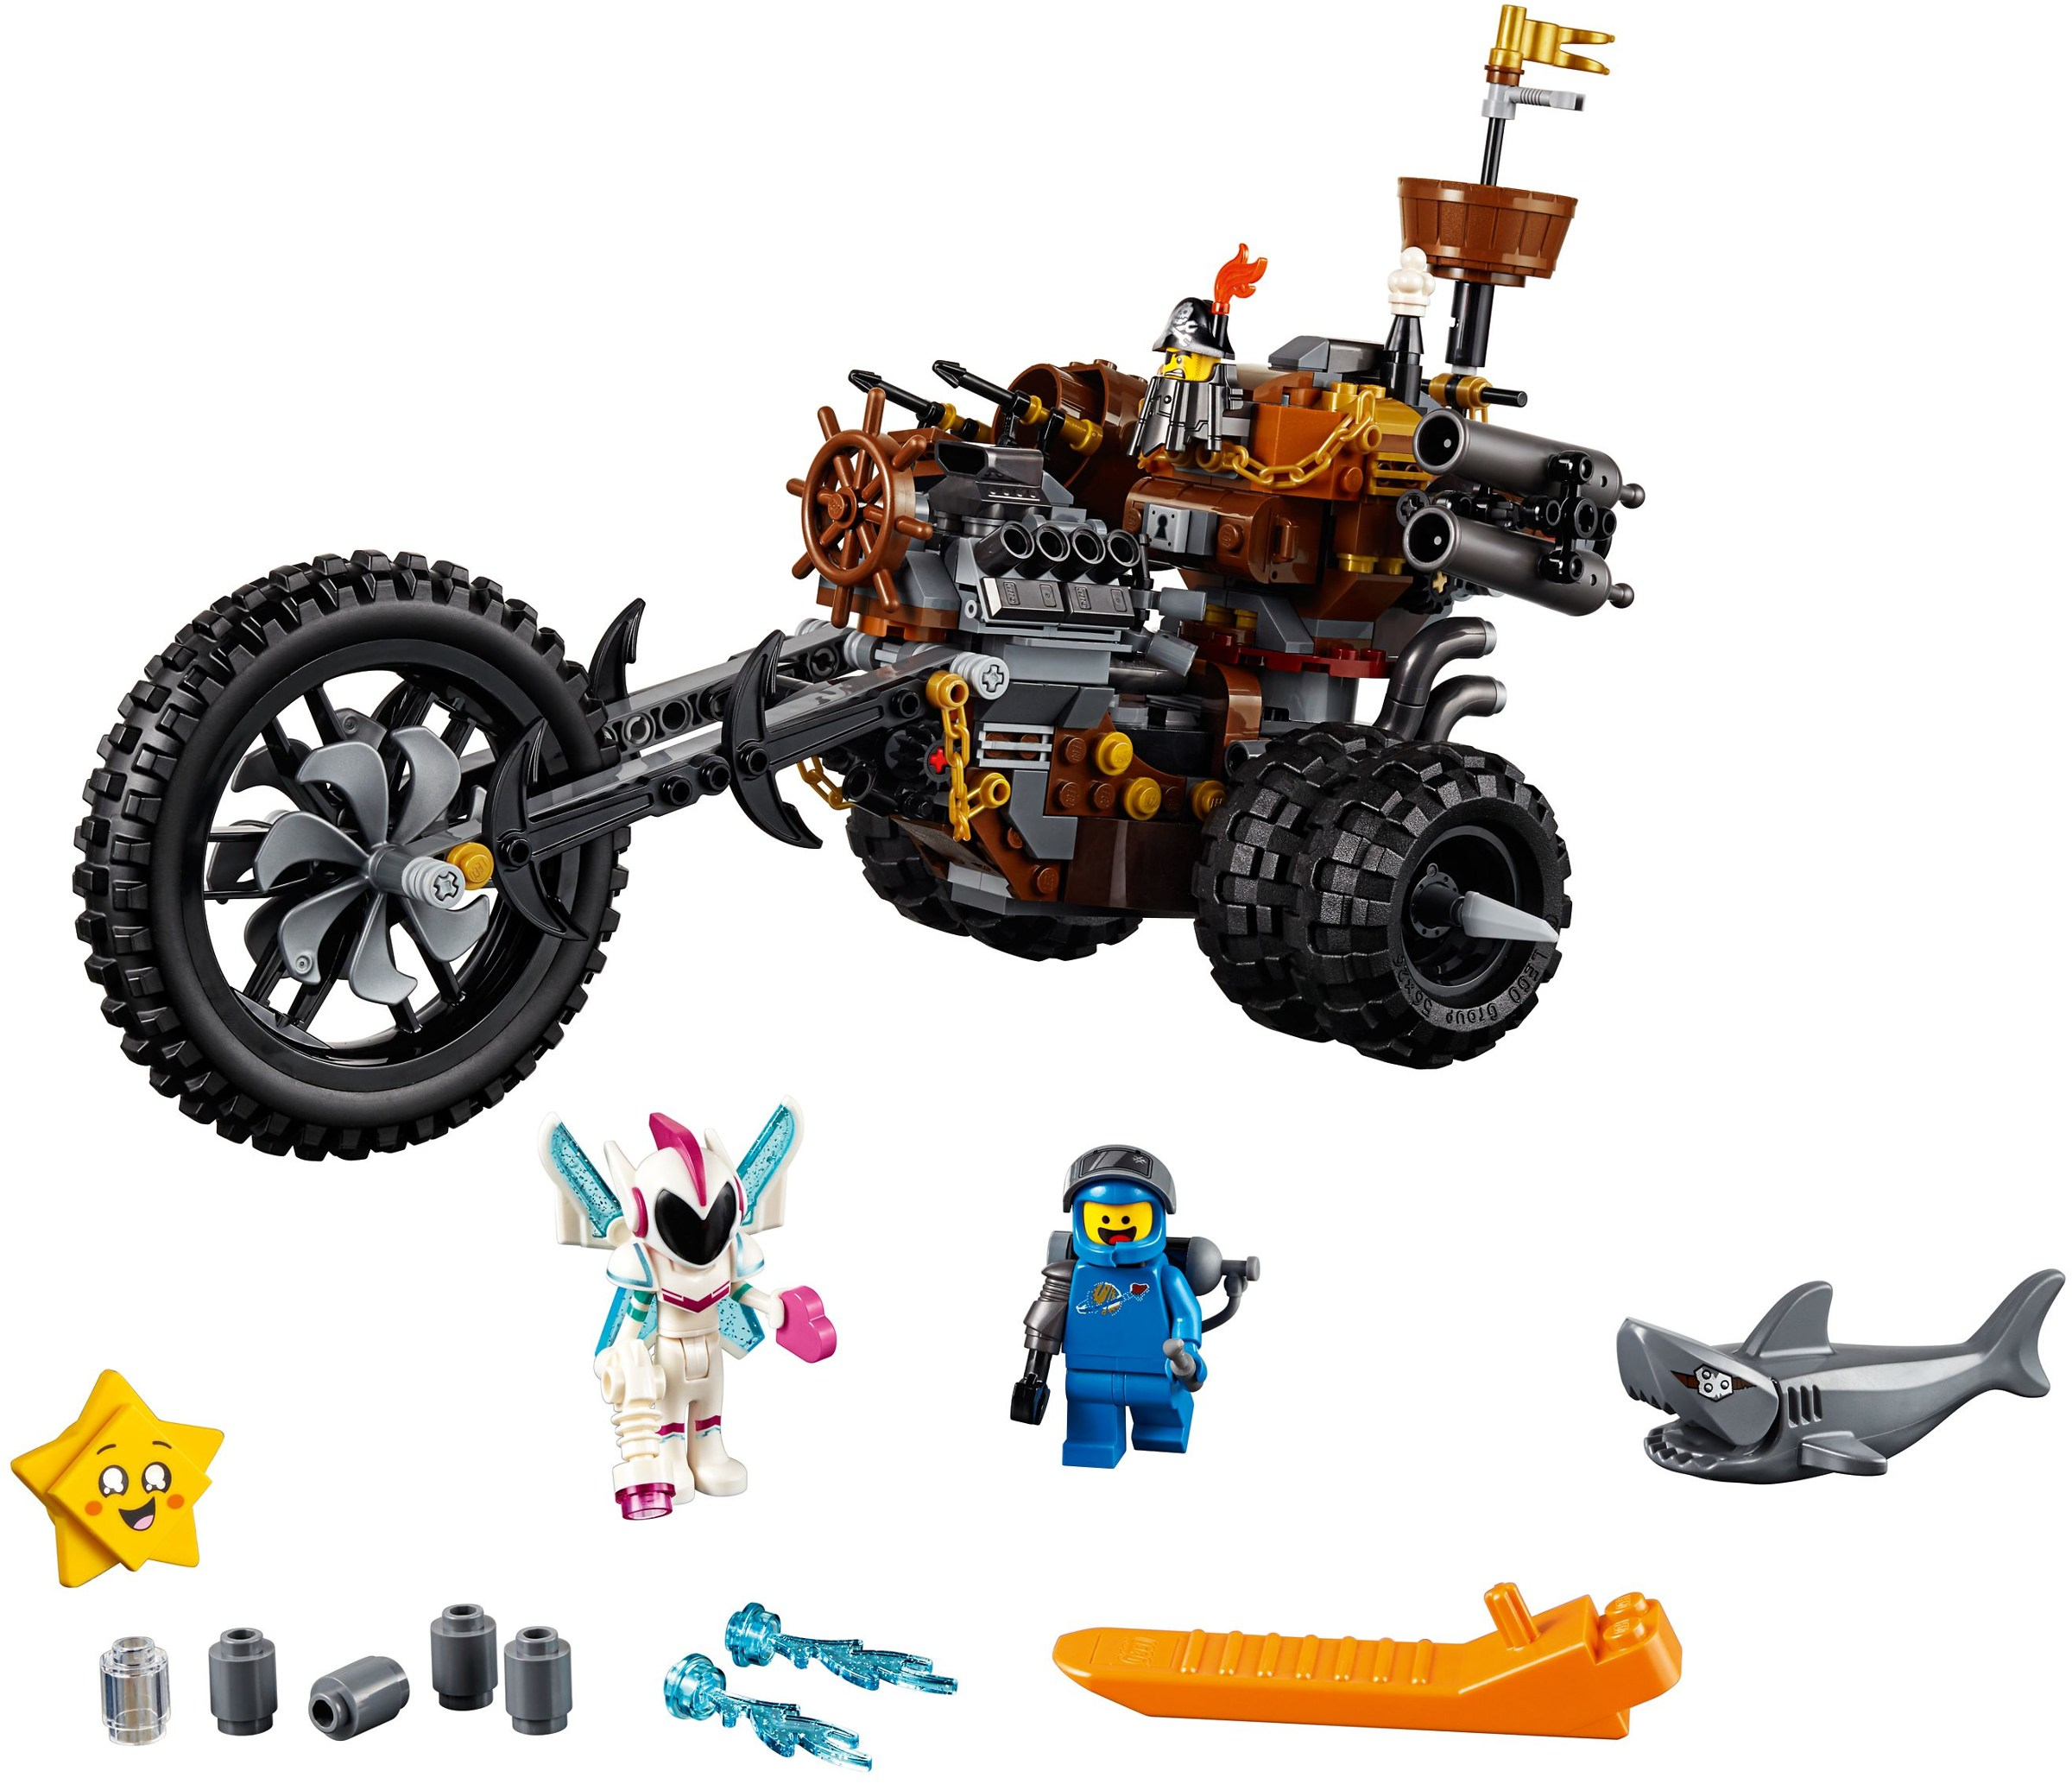 The Lego Movie 2 The Second Part 2019 Brickset Lego Set Guide